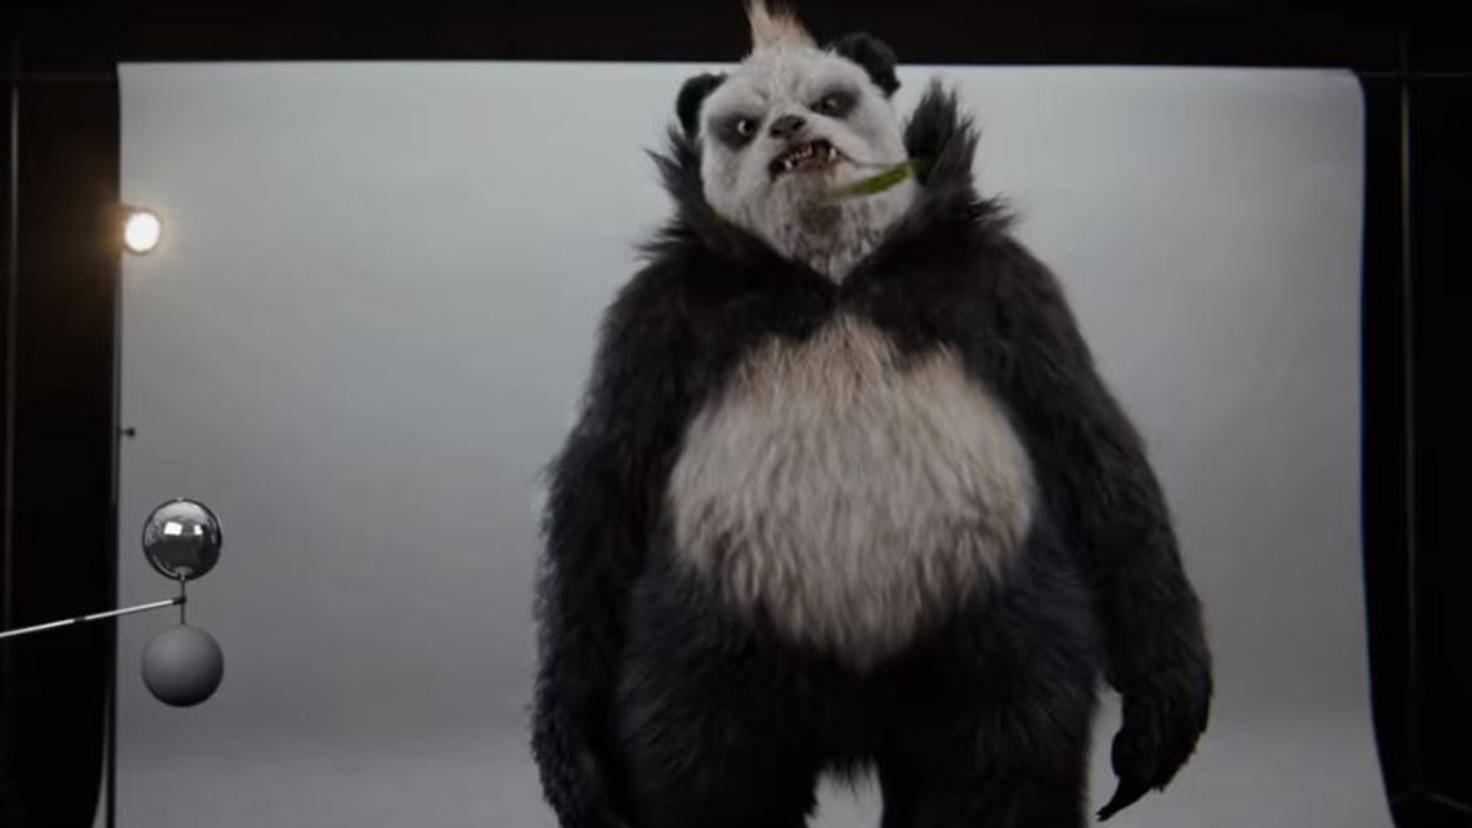 Pandagro in Pokémon Meisterdetektiv Pikachu Casting Trailer